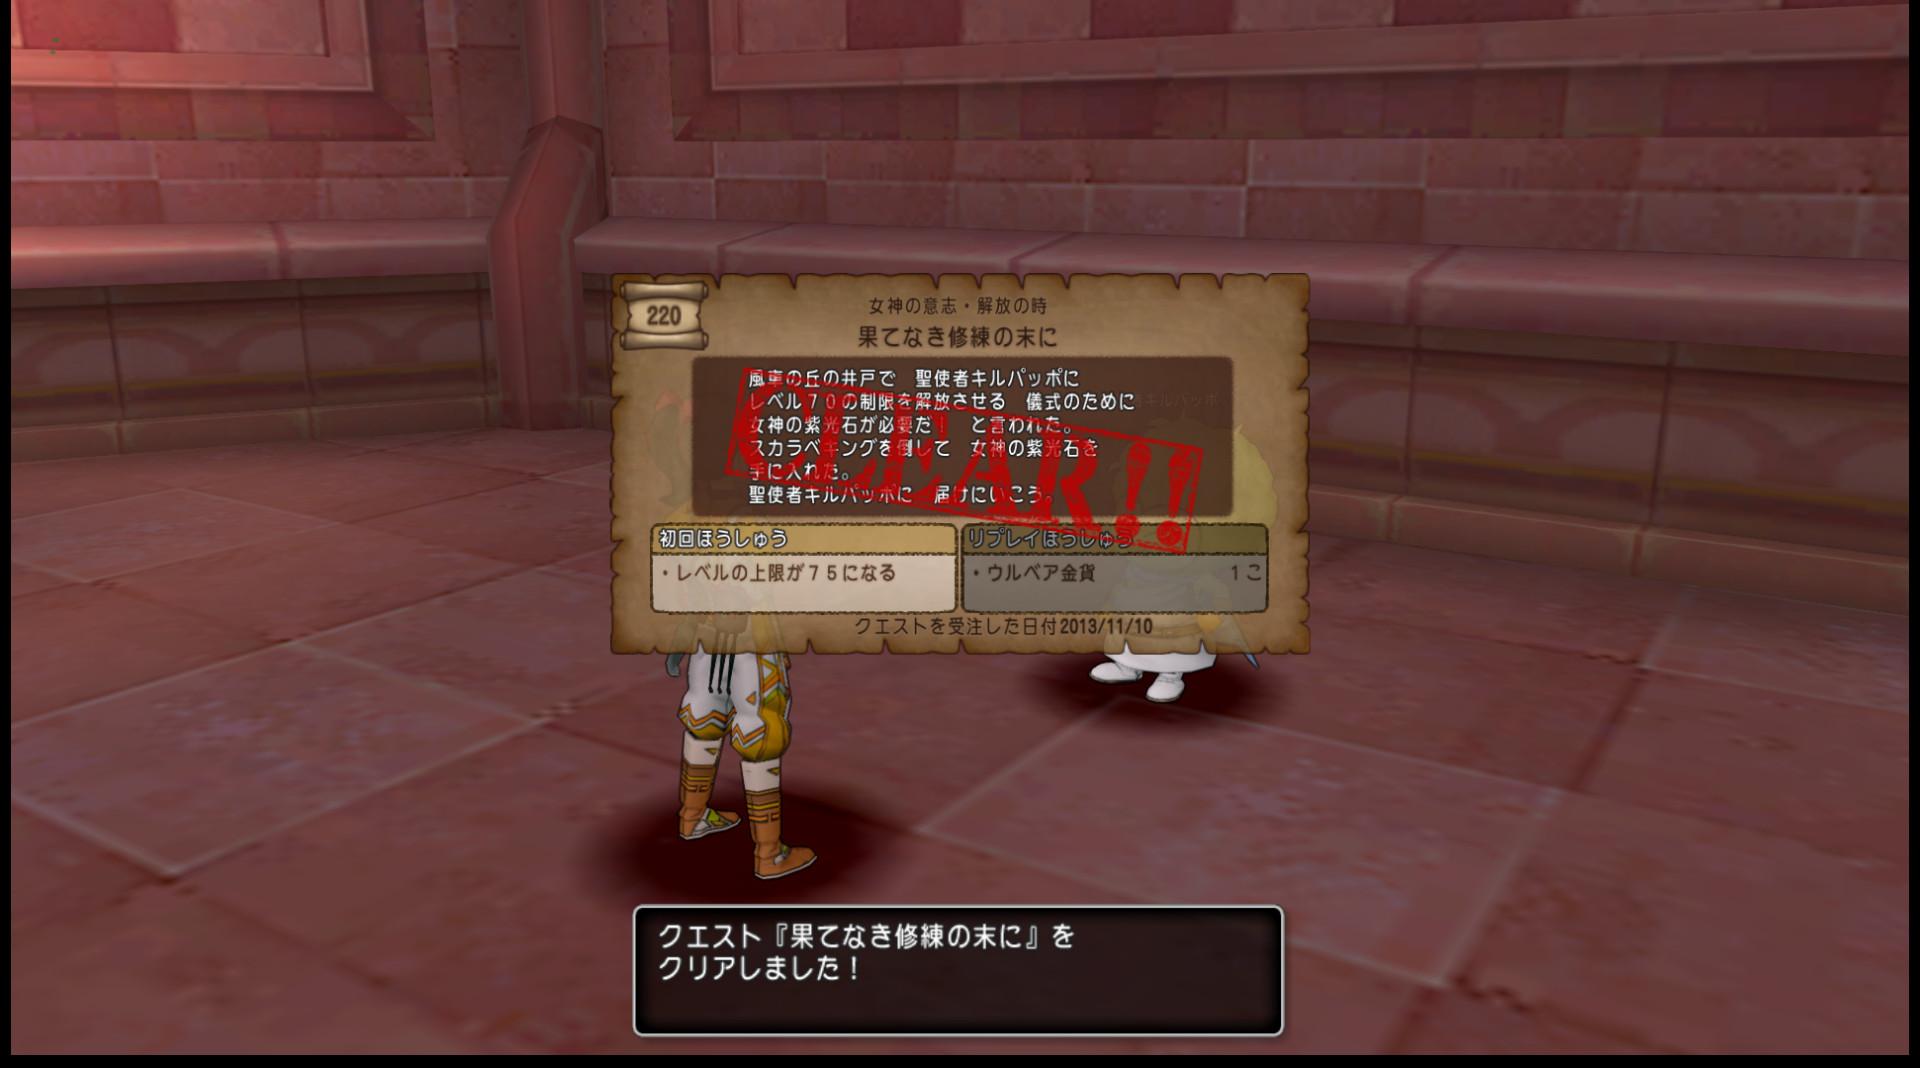 DQ10_0175.jpg